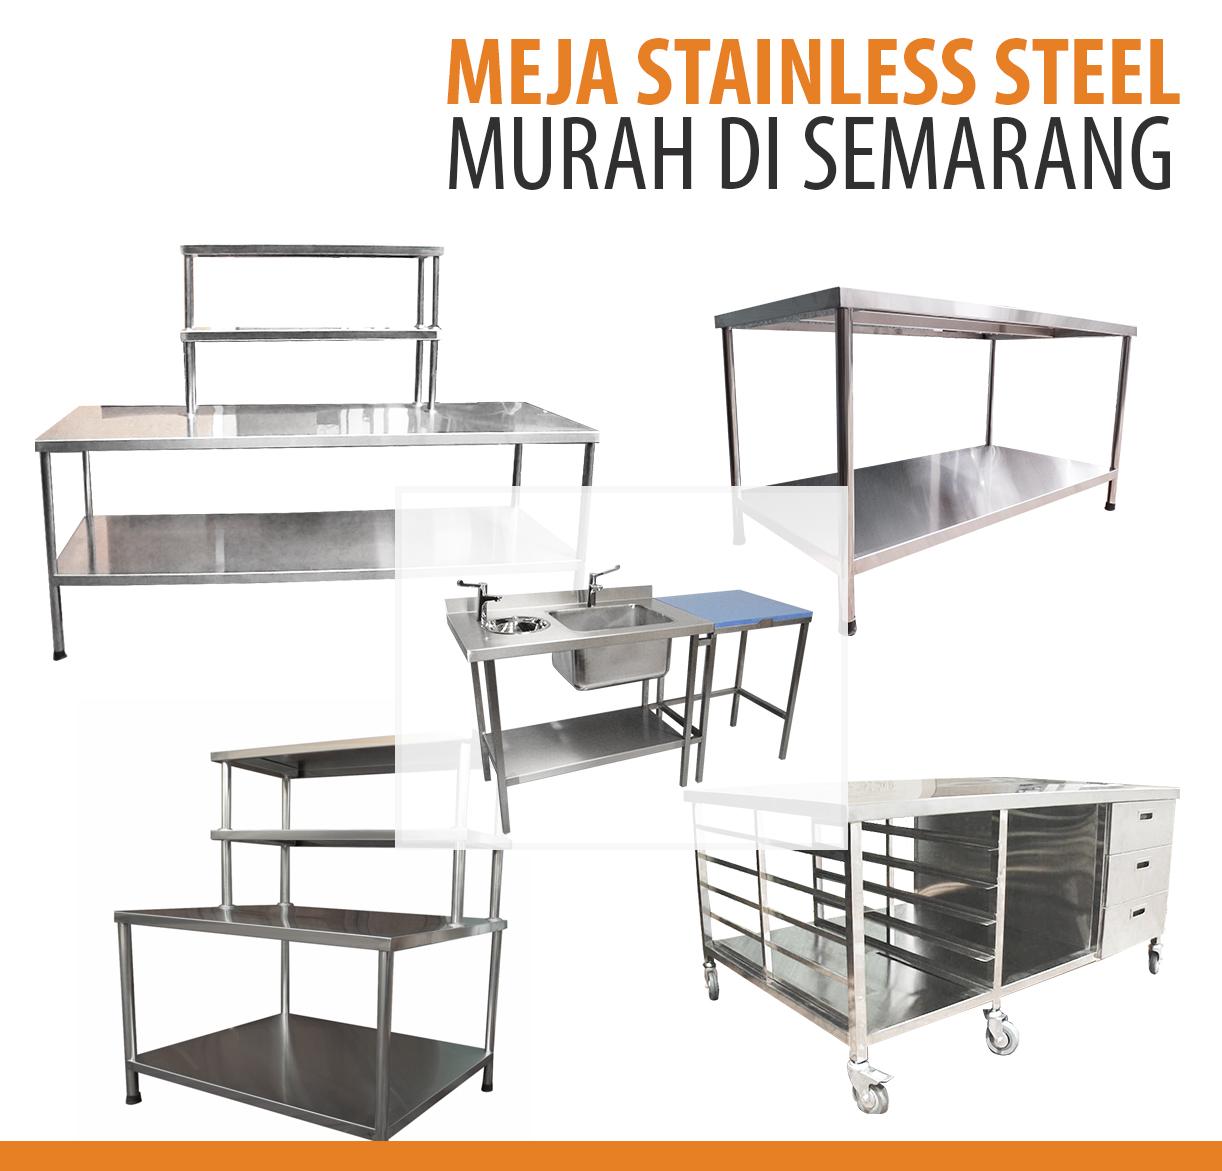 Jual Meja Stainless Steel Semarang